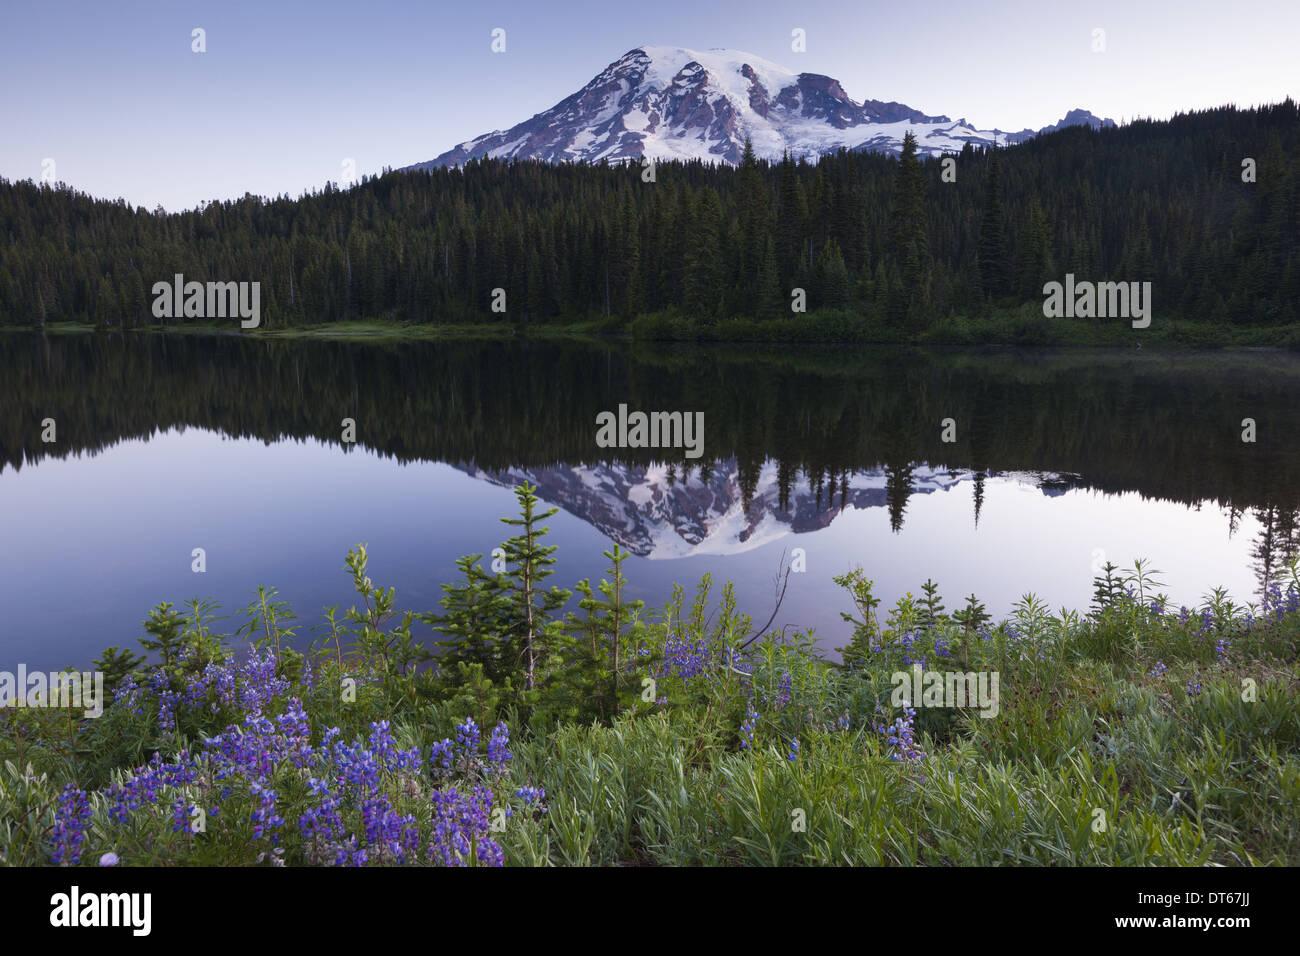 Mount Rainier, a snowcapped peak in Washington, USA - Stock Image